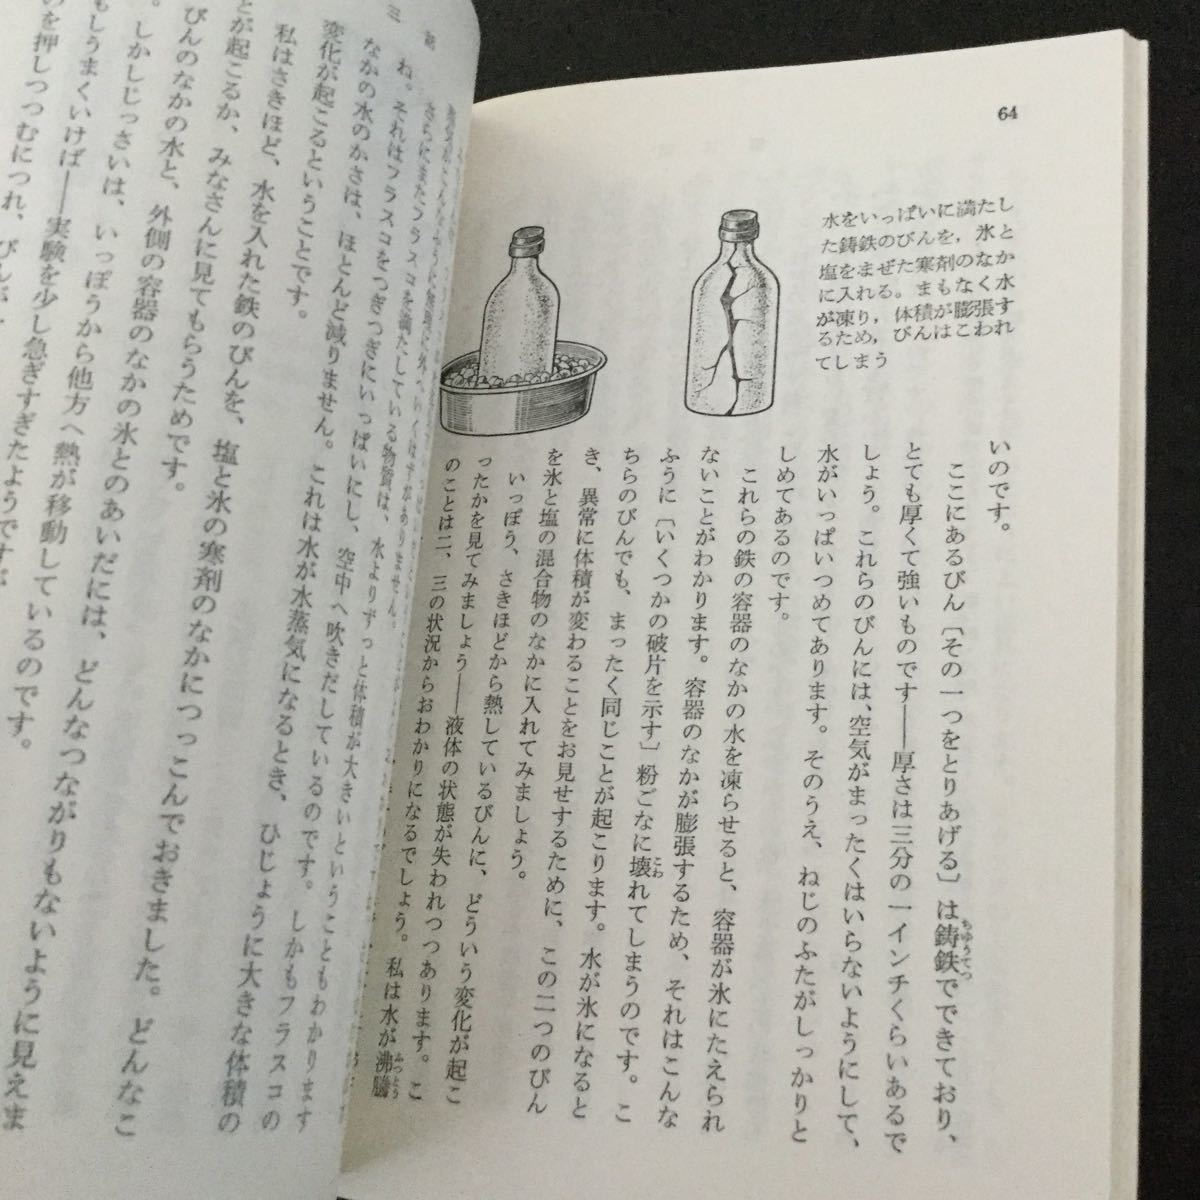 a37 ロウソクの科学 ファラデー 日下実男 小説 旺文社文庫 旺文社 _画像7